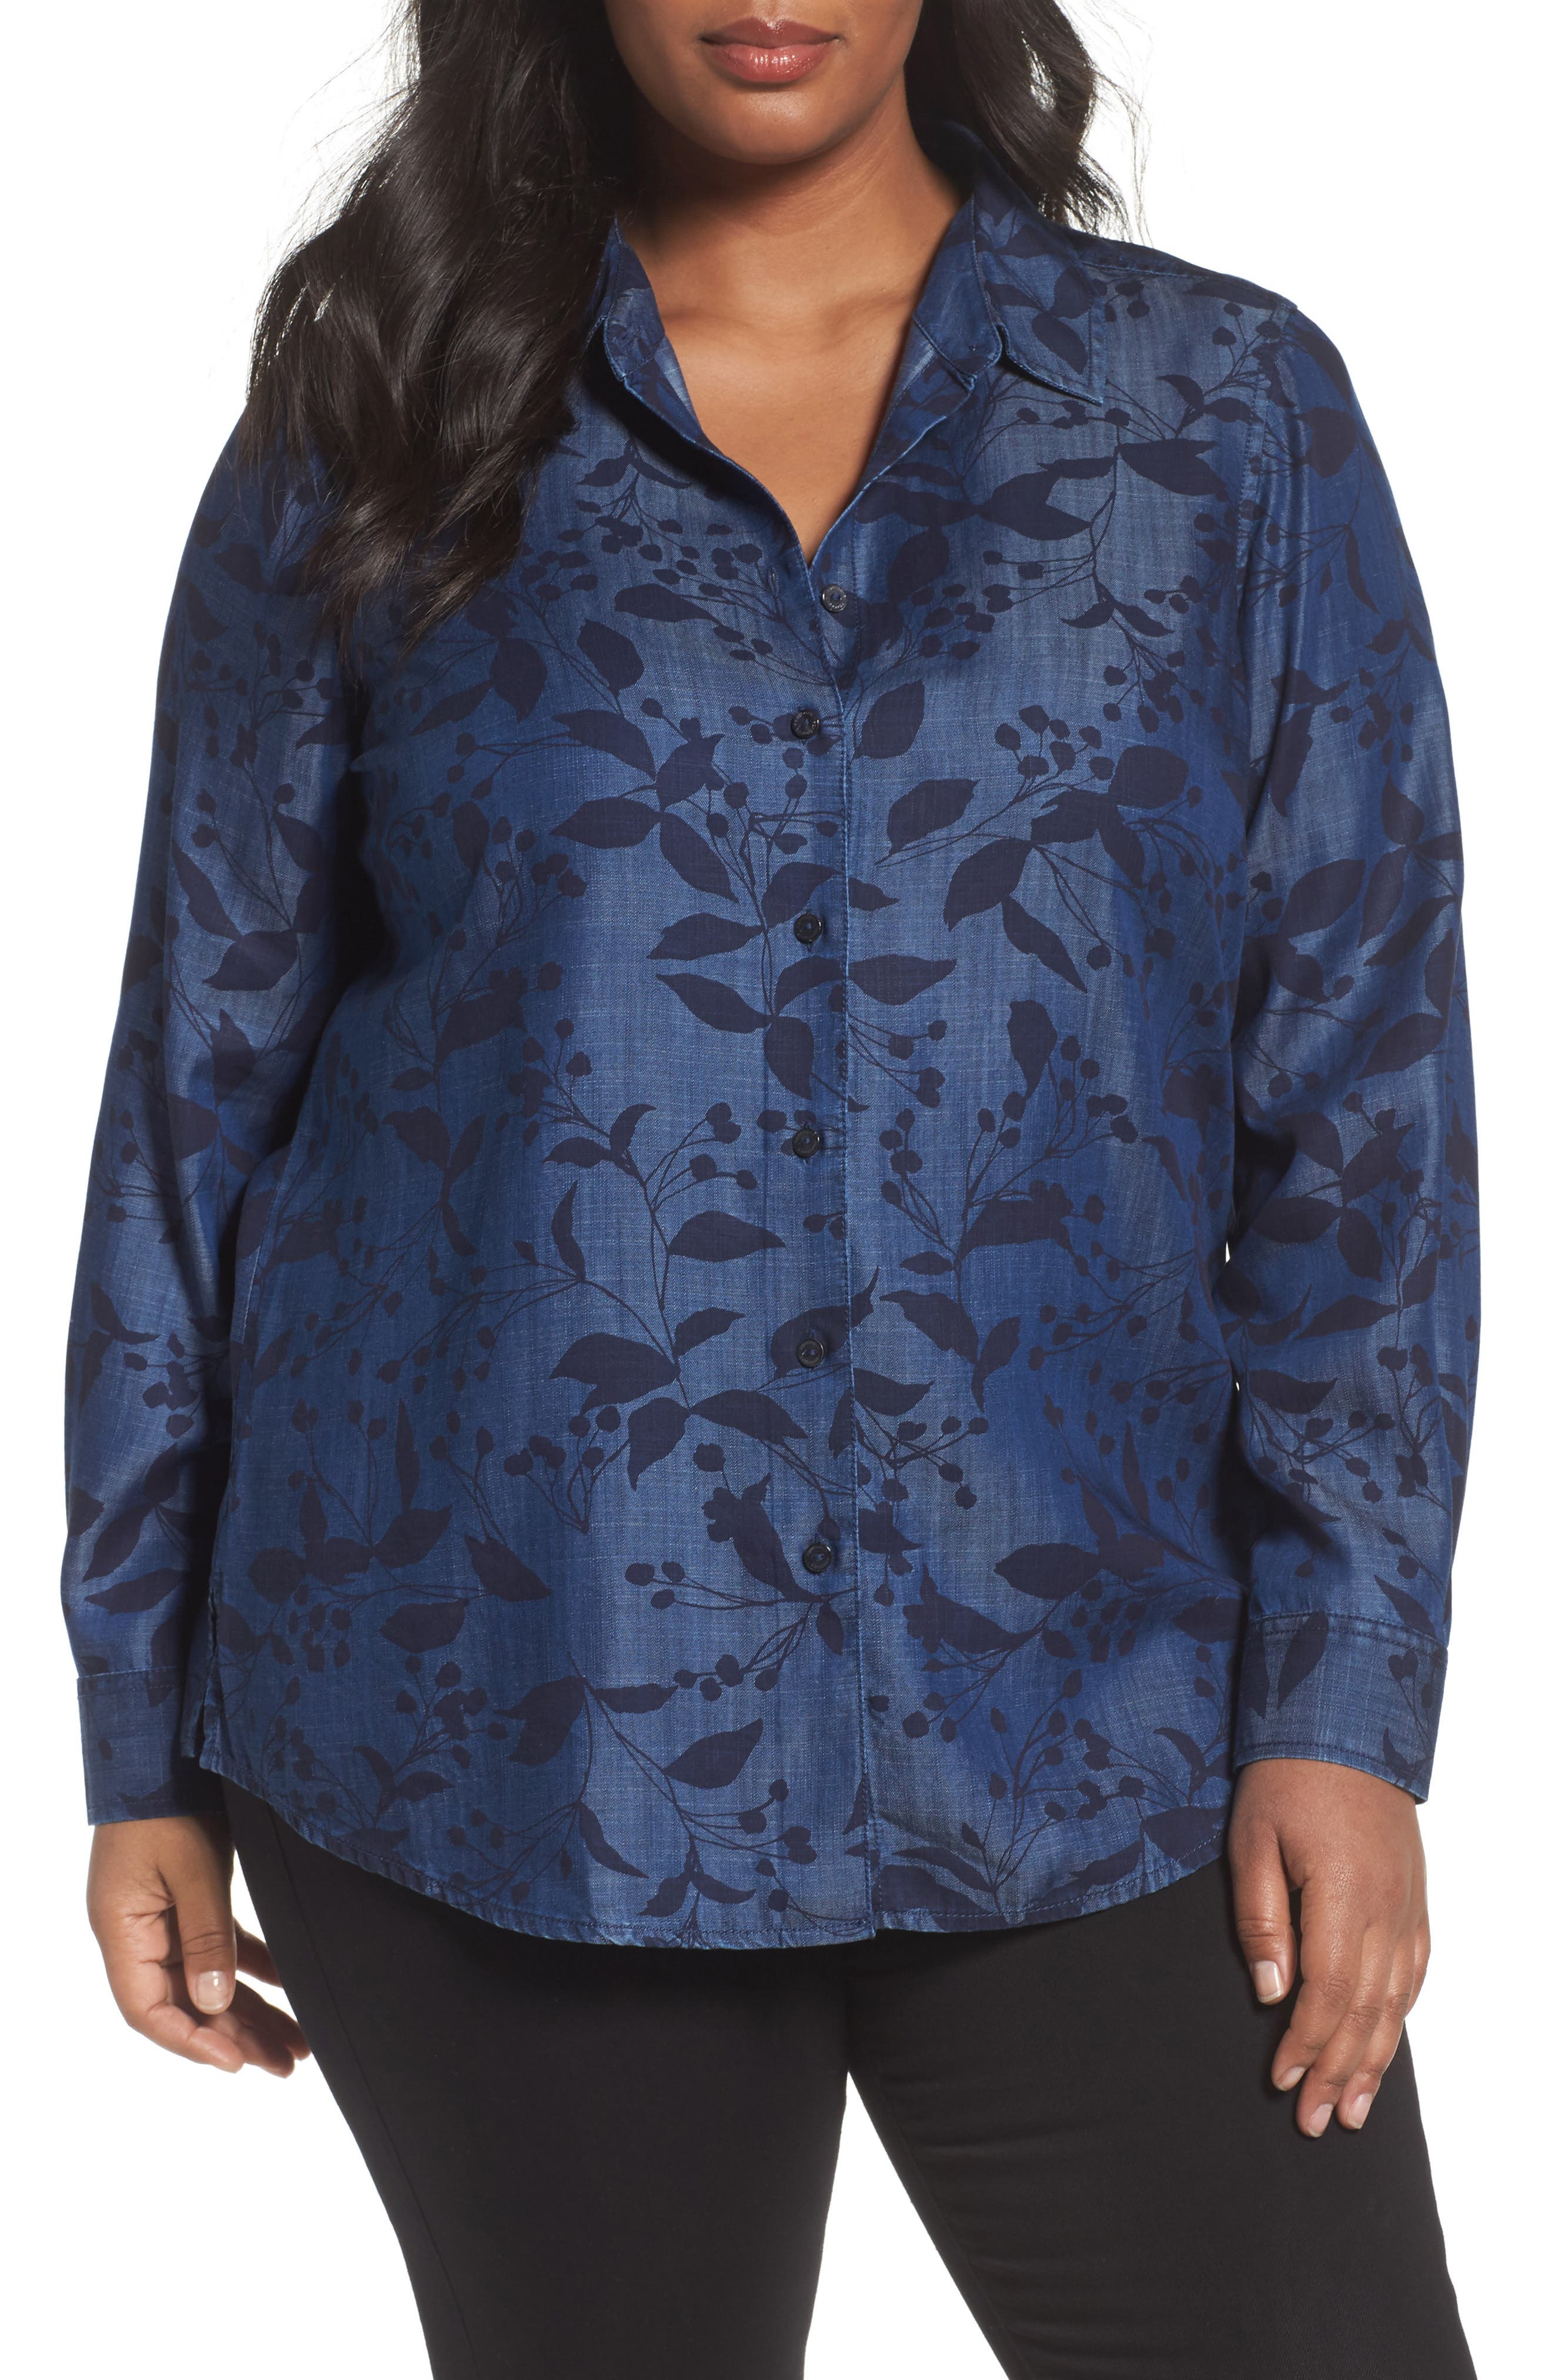 Alternate Image 1 Selected - Foxcroft Addison Floral Print Tencel® Shirt (Plus Size)